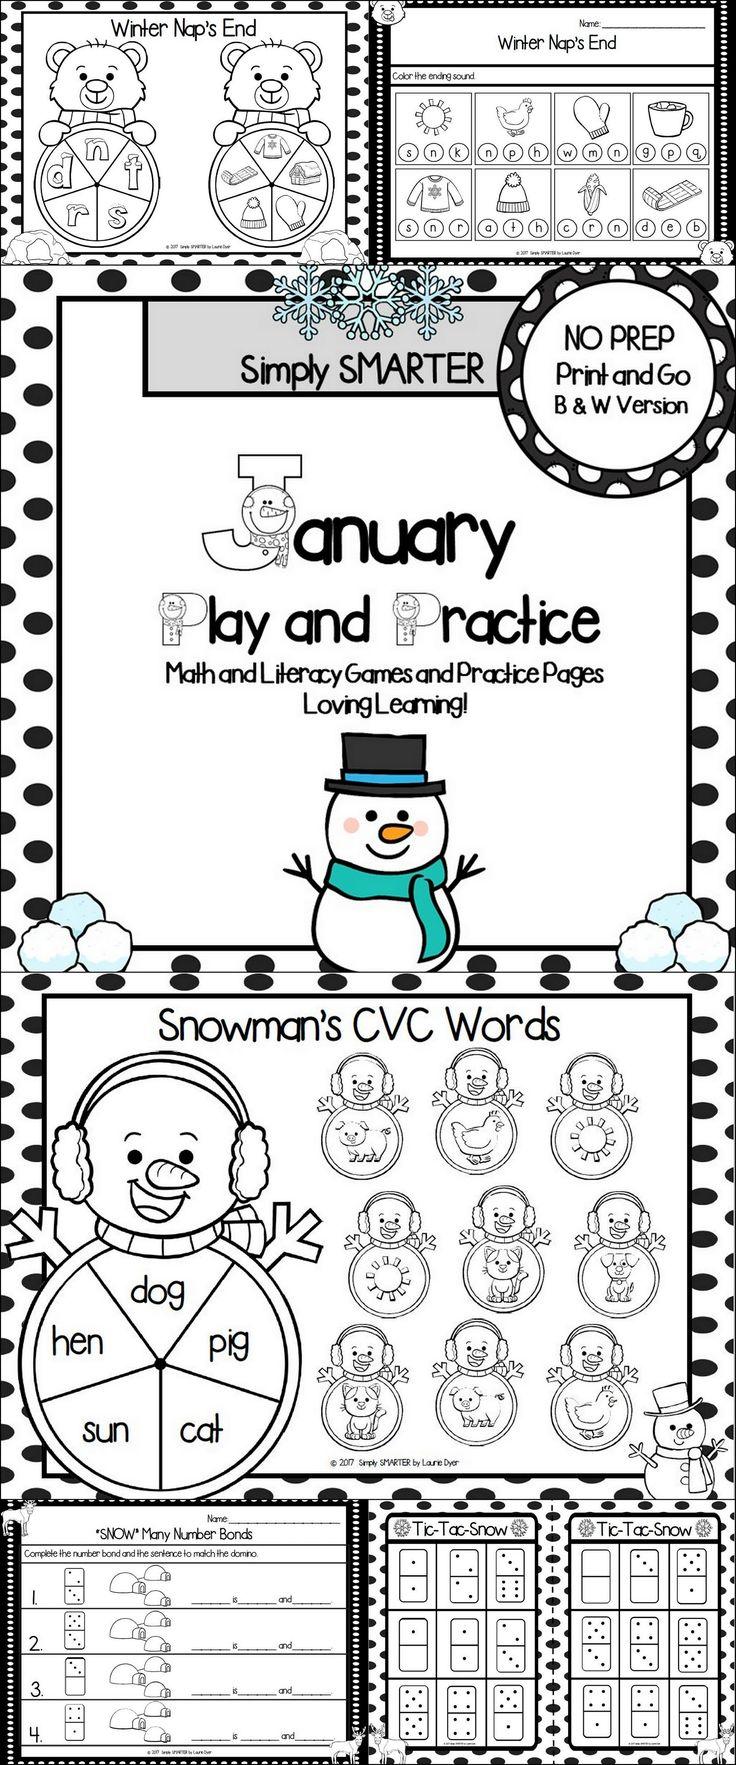 Workbooks mab worksheets : Best 25+ Grade 3 math worksheets ideas on Pinterest | Grade 2 math ...